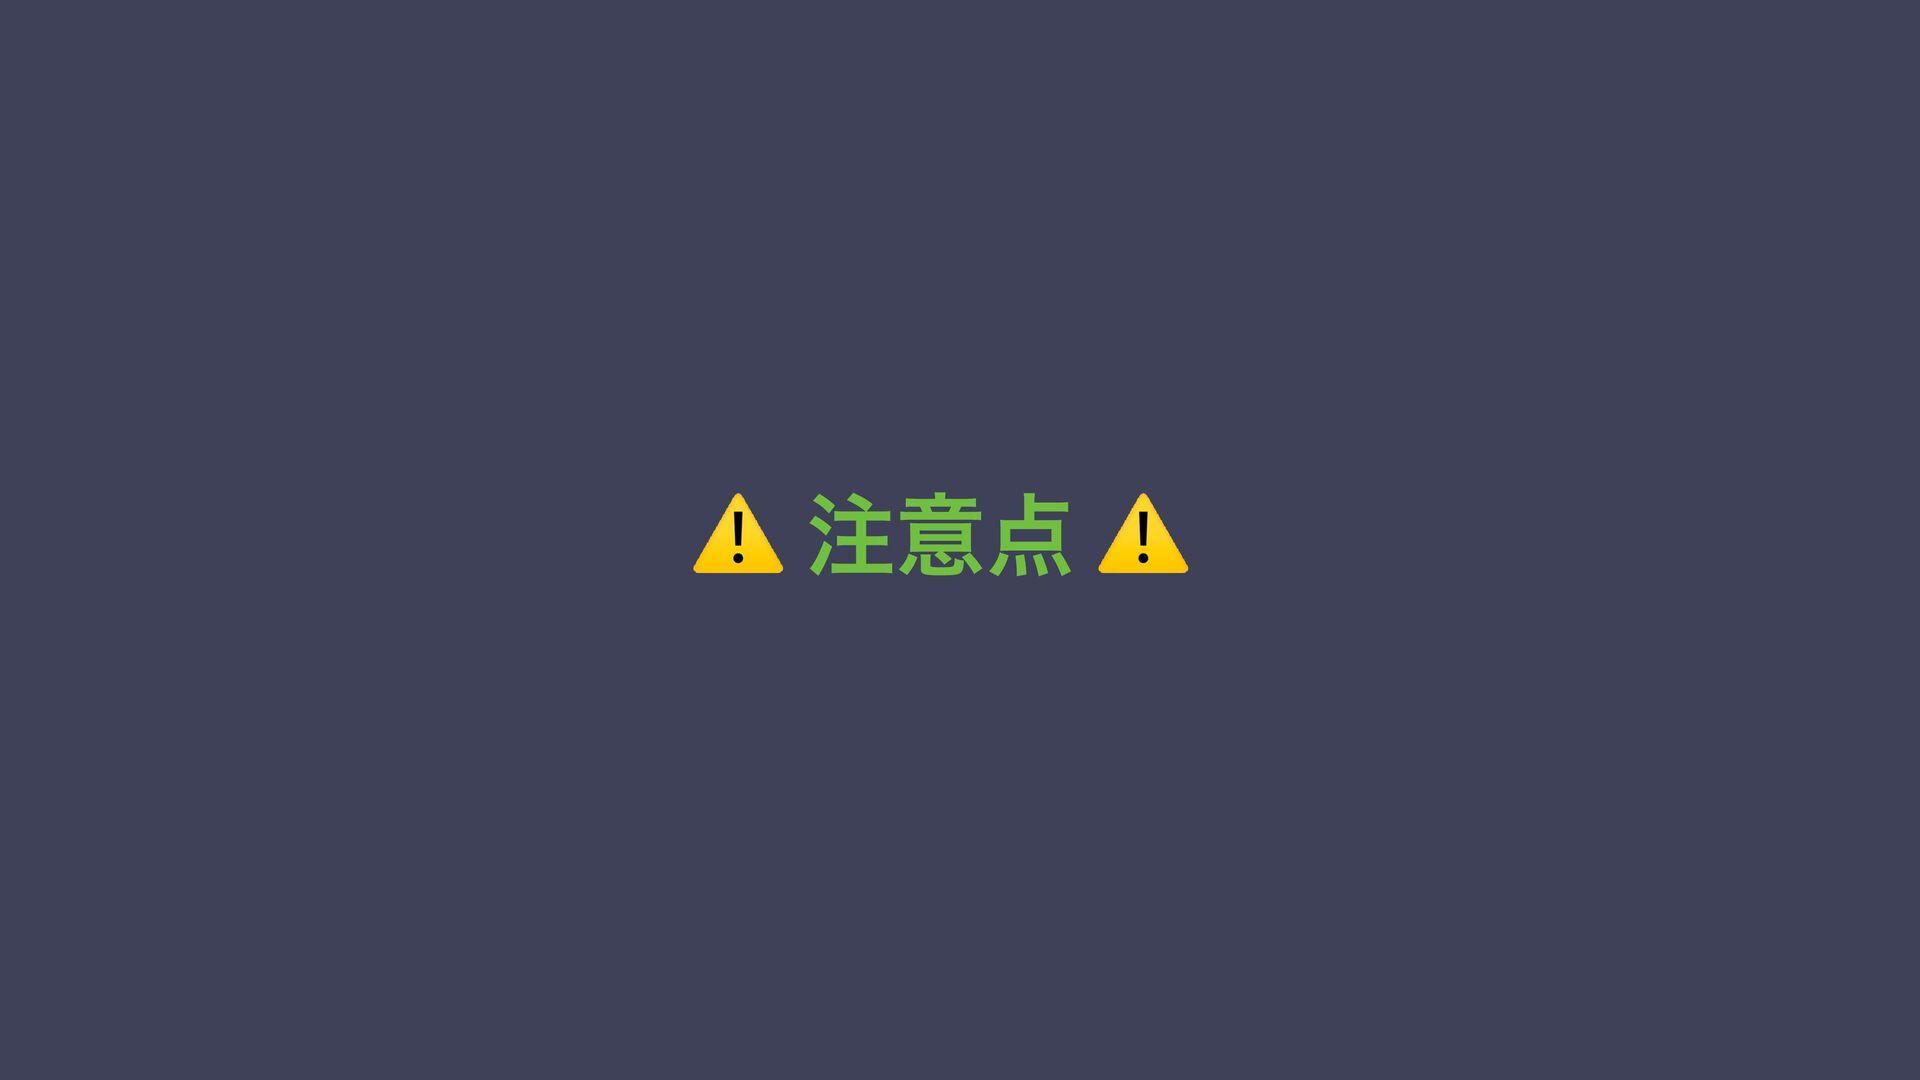 ⚠ ҙ ⚠